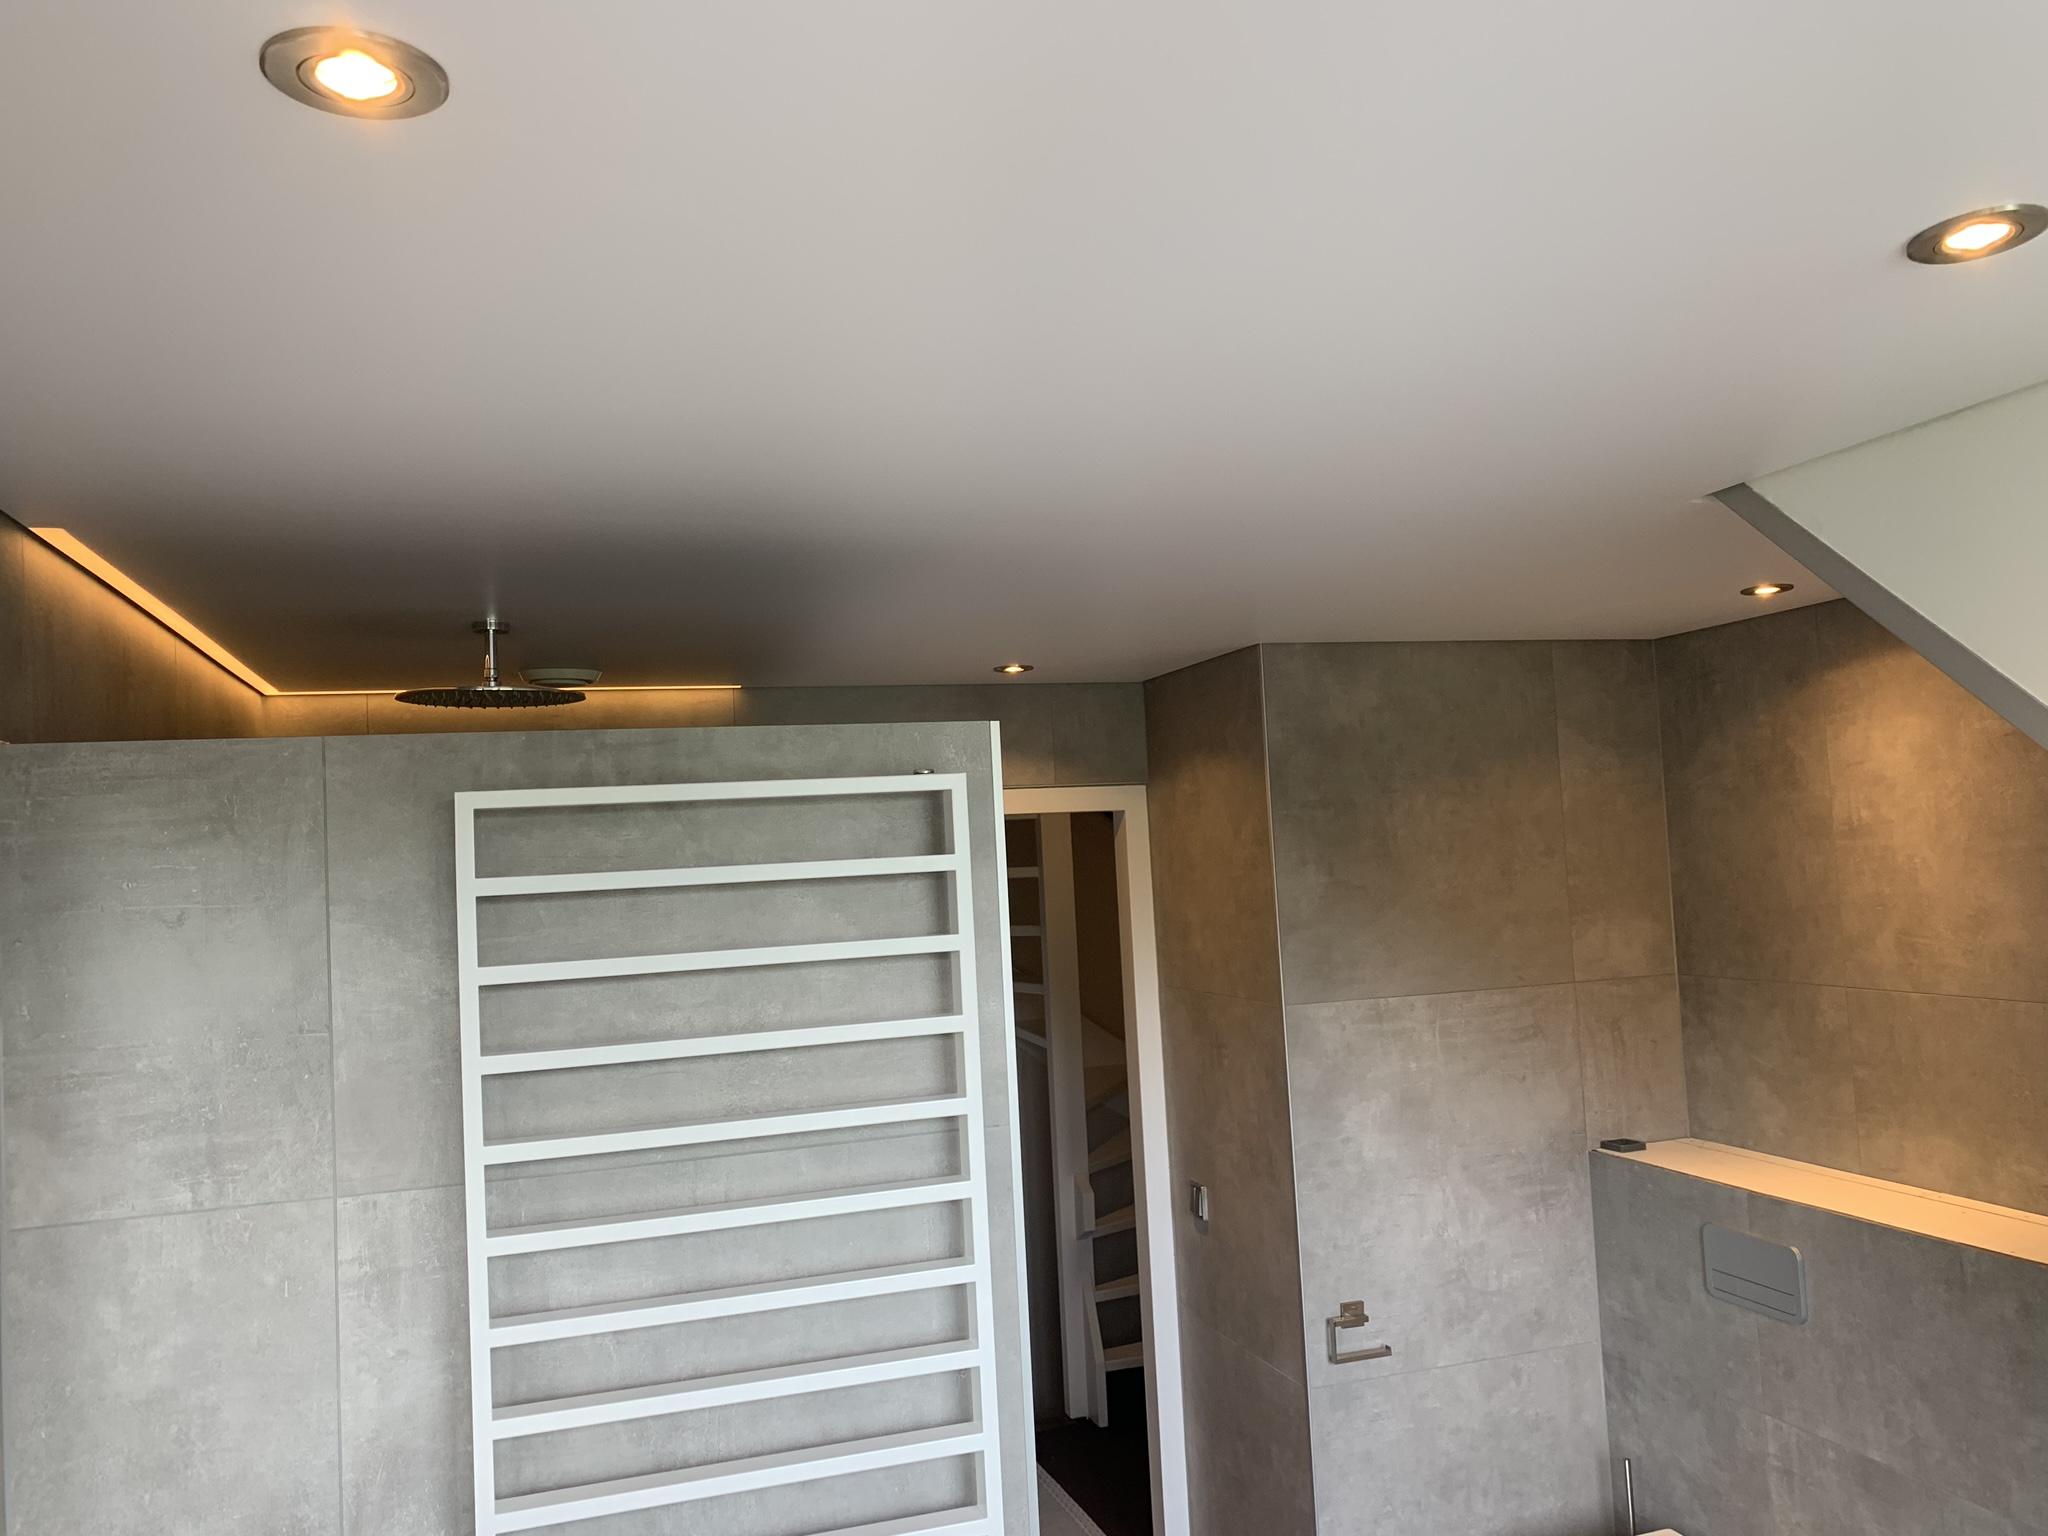 de mooiste strakke plafond met een indara spanplafond